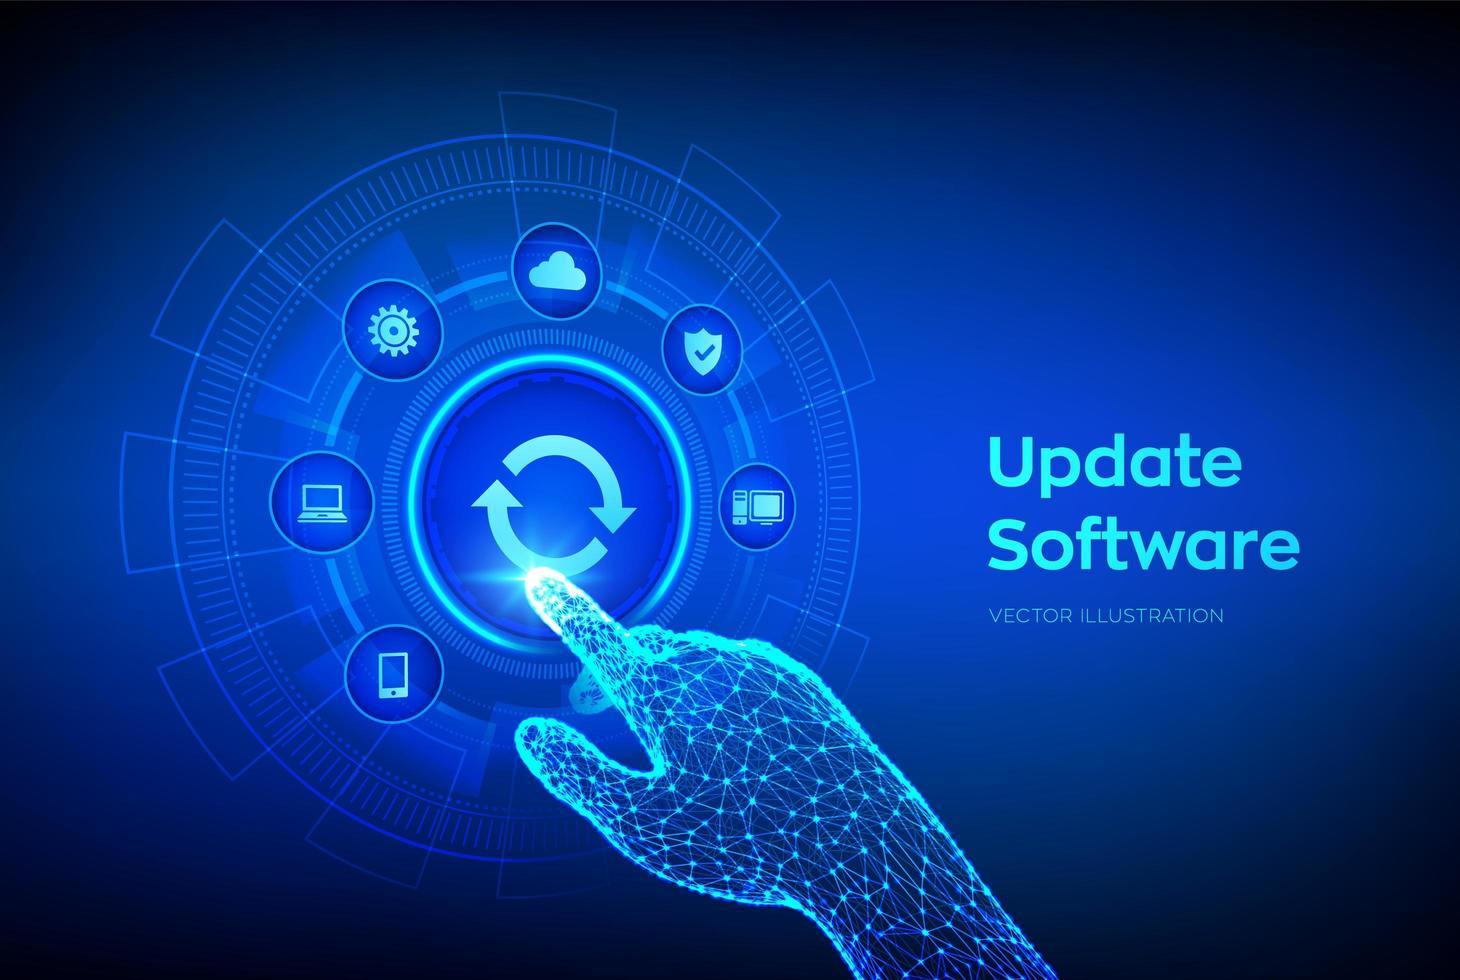 Upgrade Software version  vector